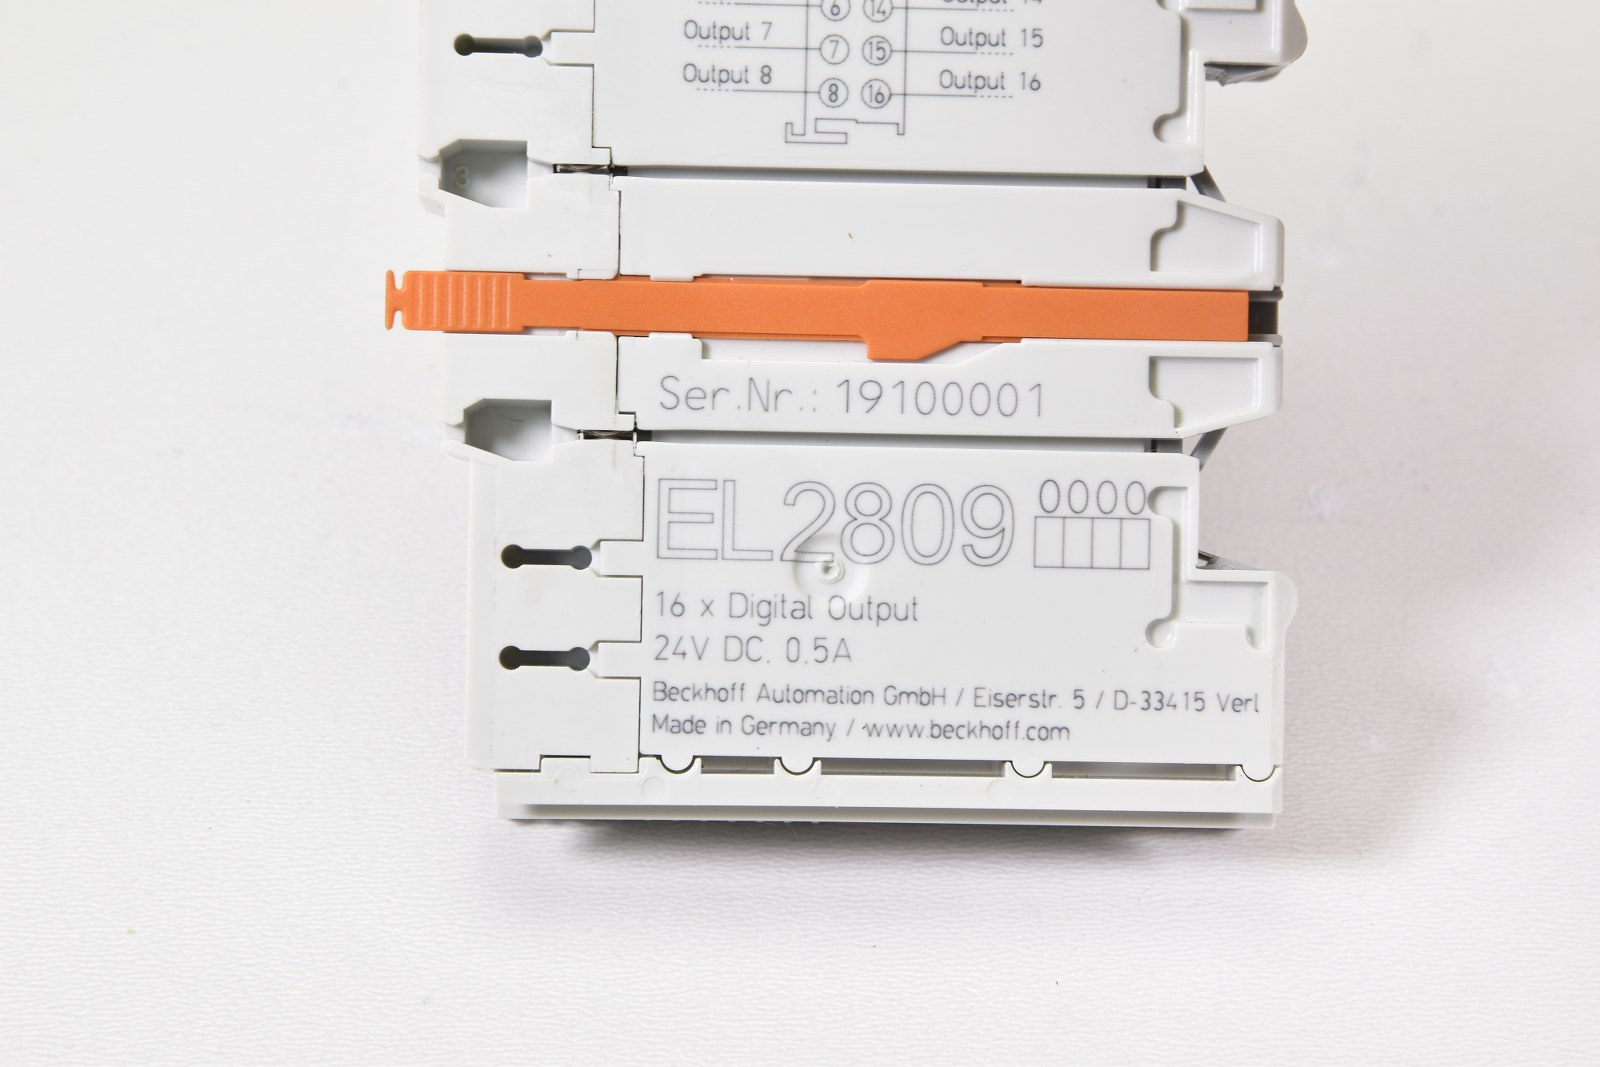 Beckhoff 16-Kanal-Digital-Ausgang EL2809